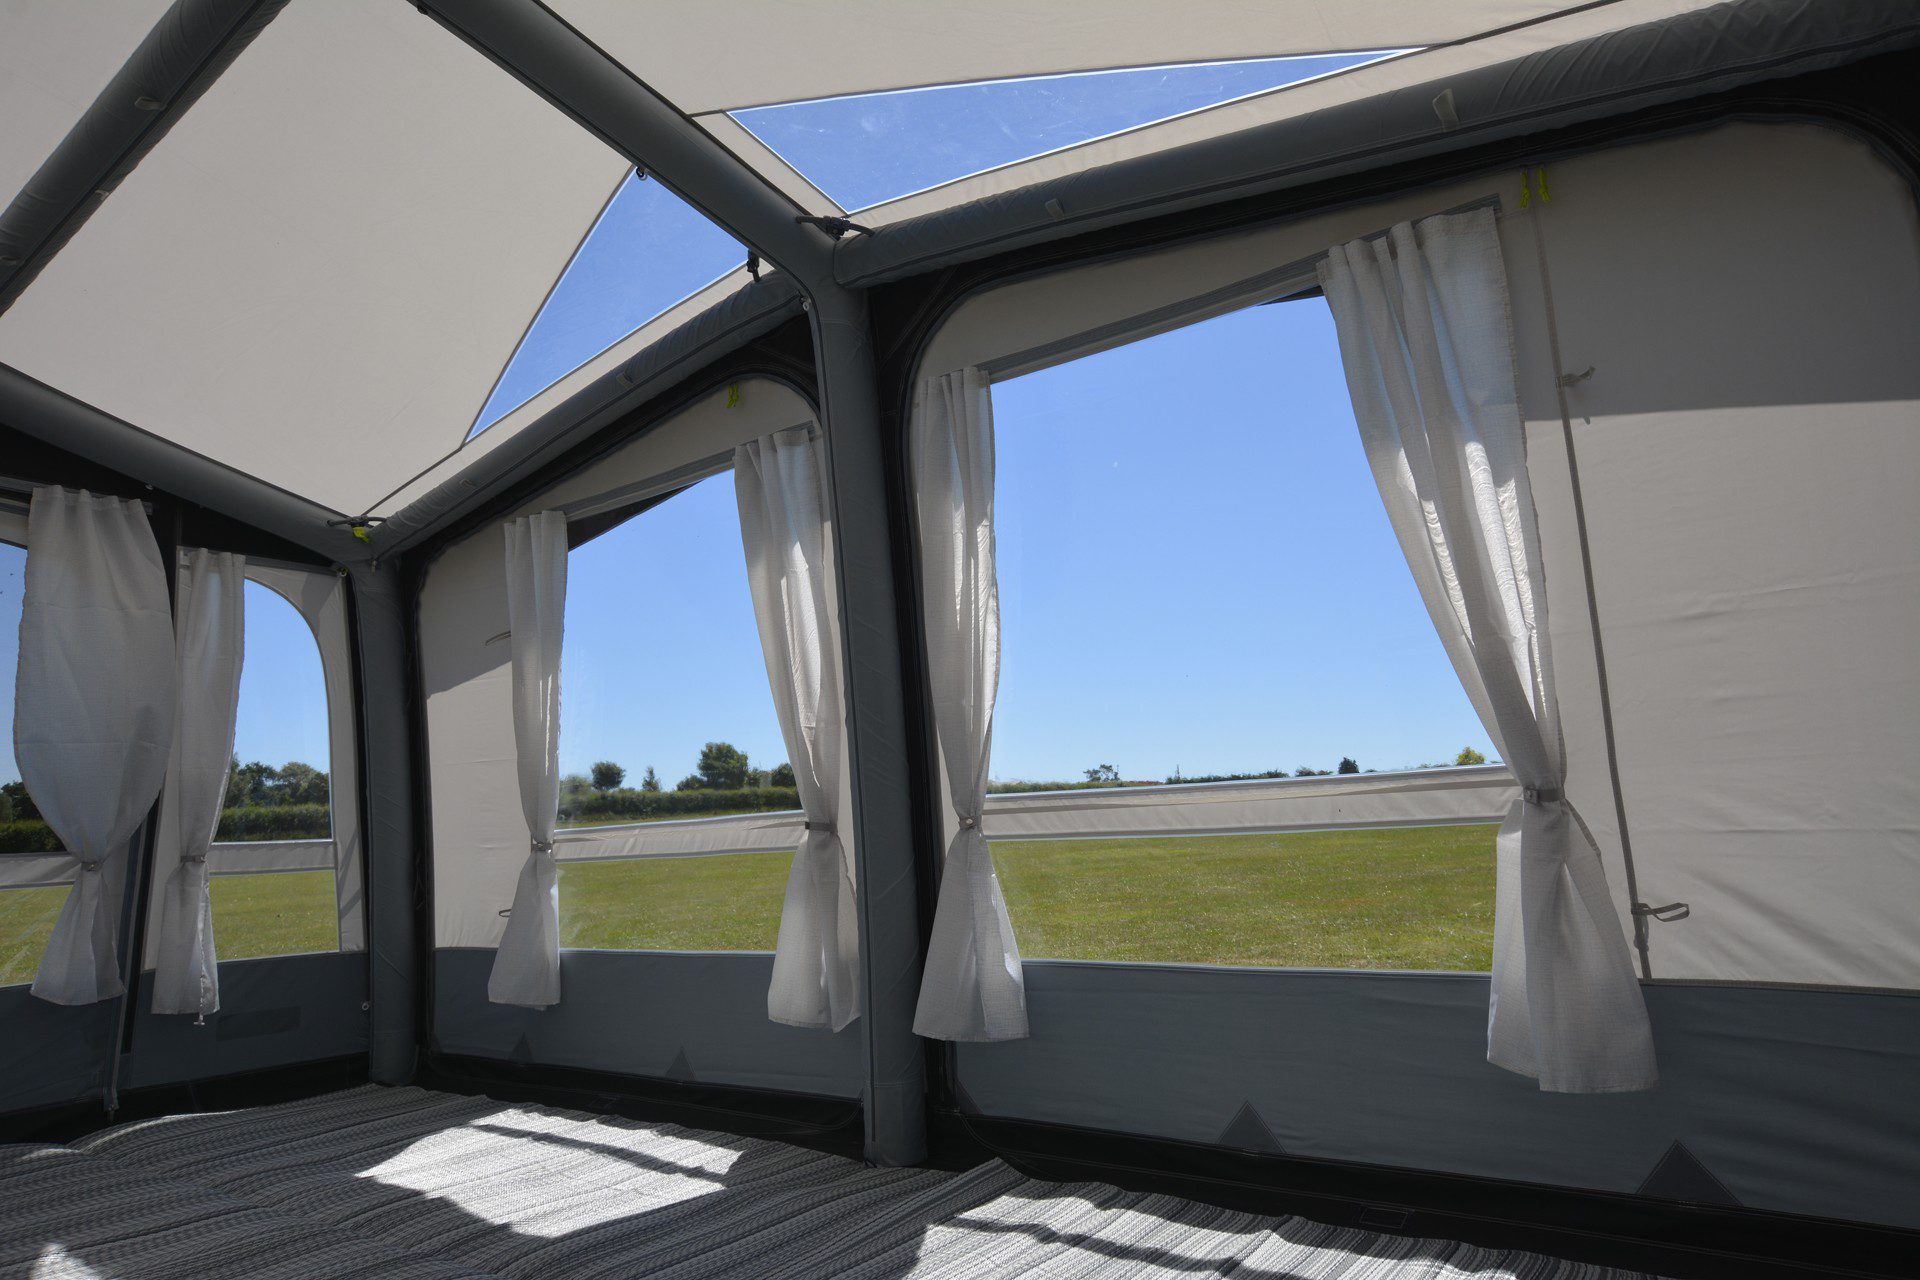 Kampa Club Air Pro 450 Caravan Awning 2019 5